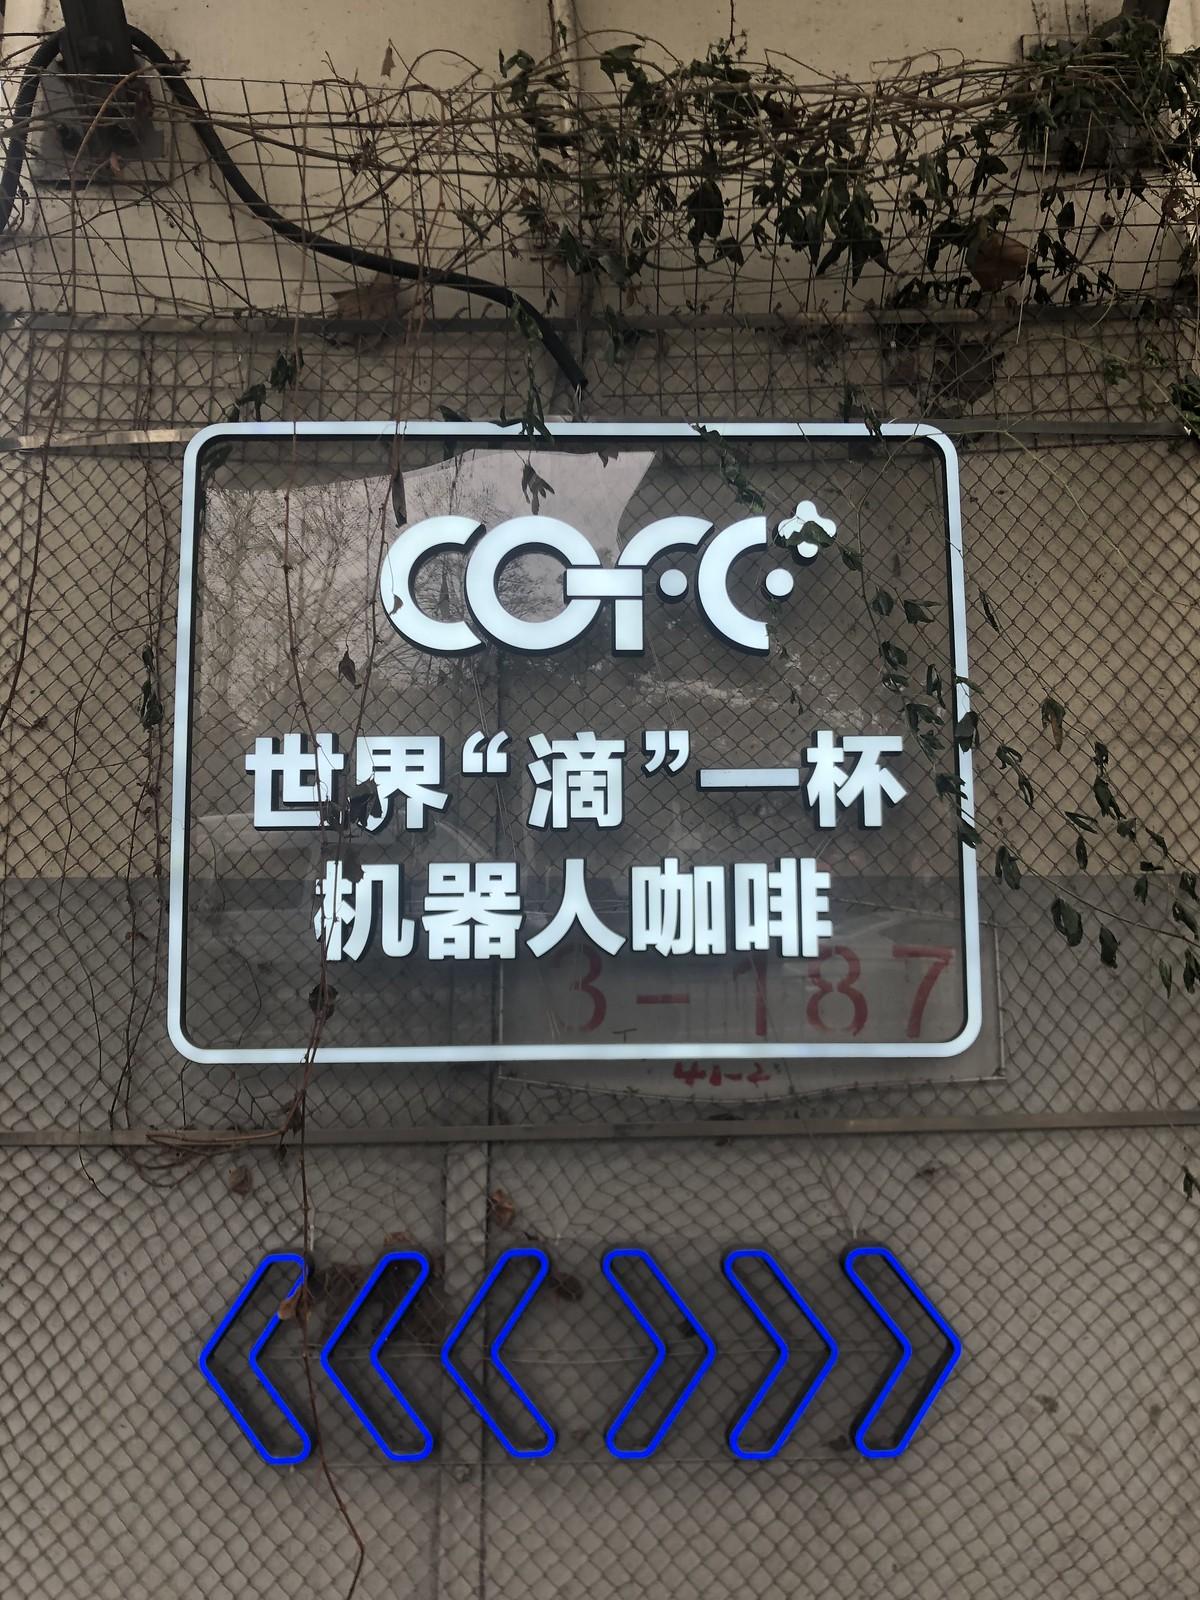 Robot-Coffee-ad